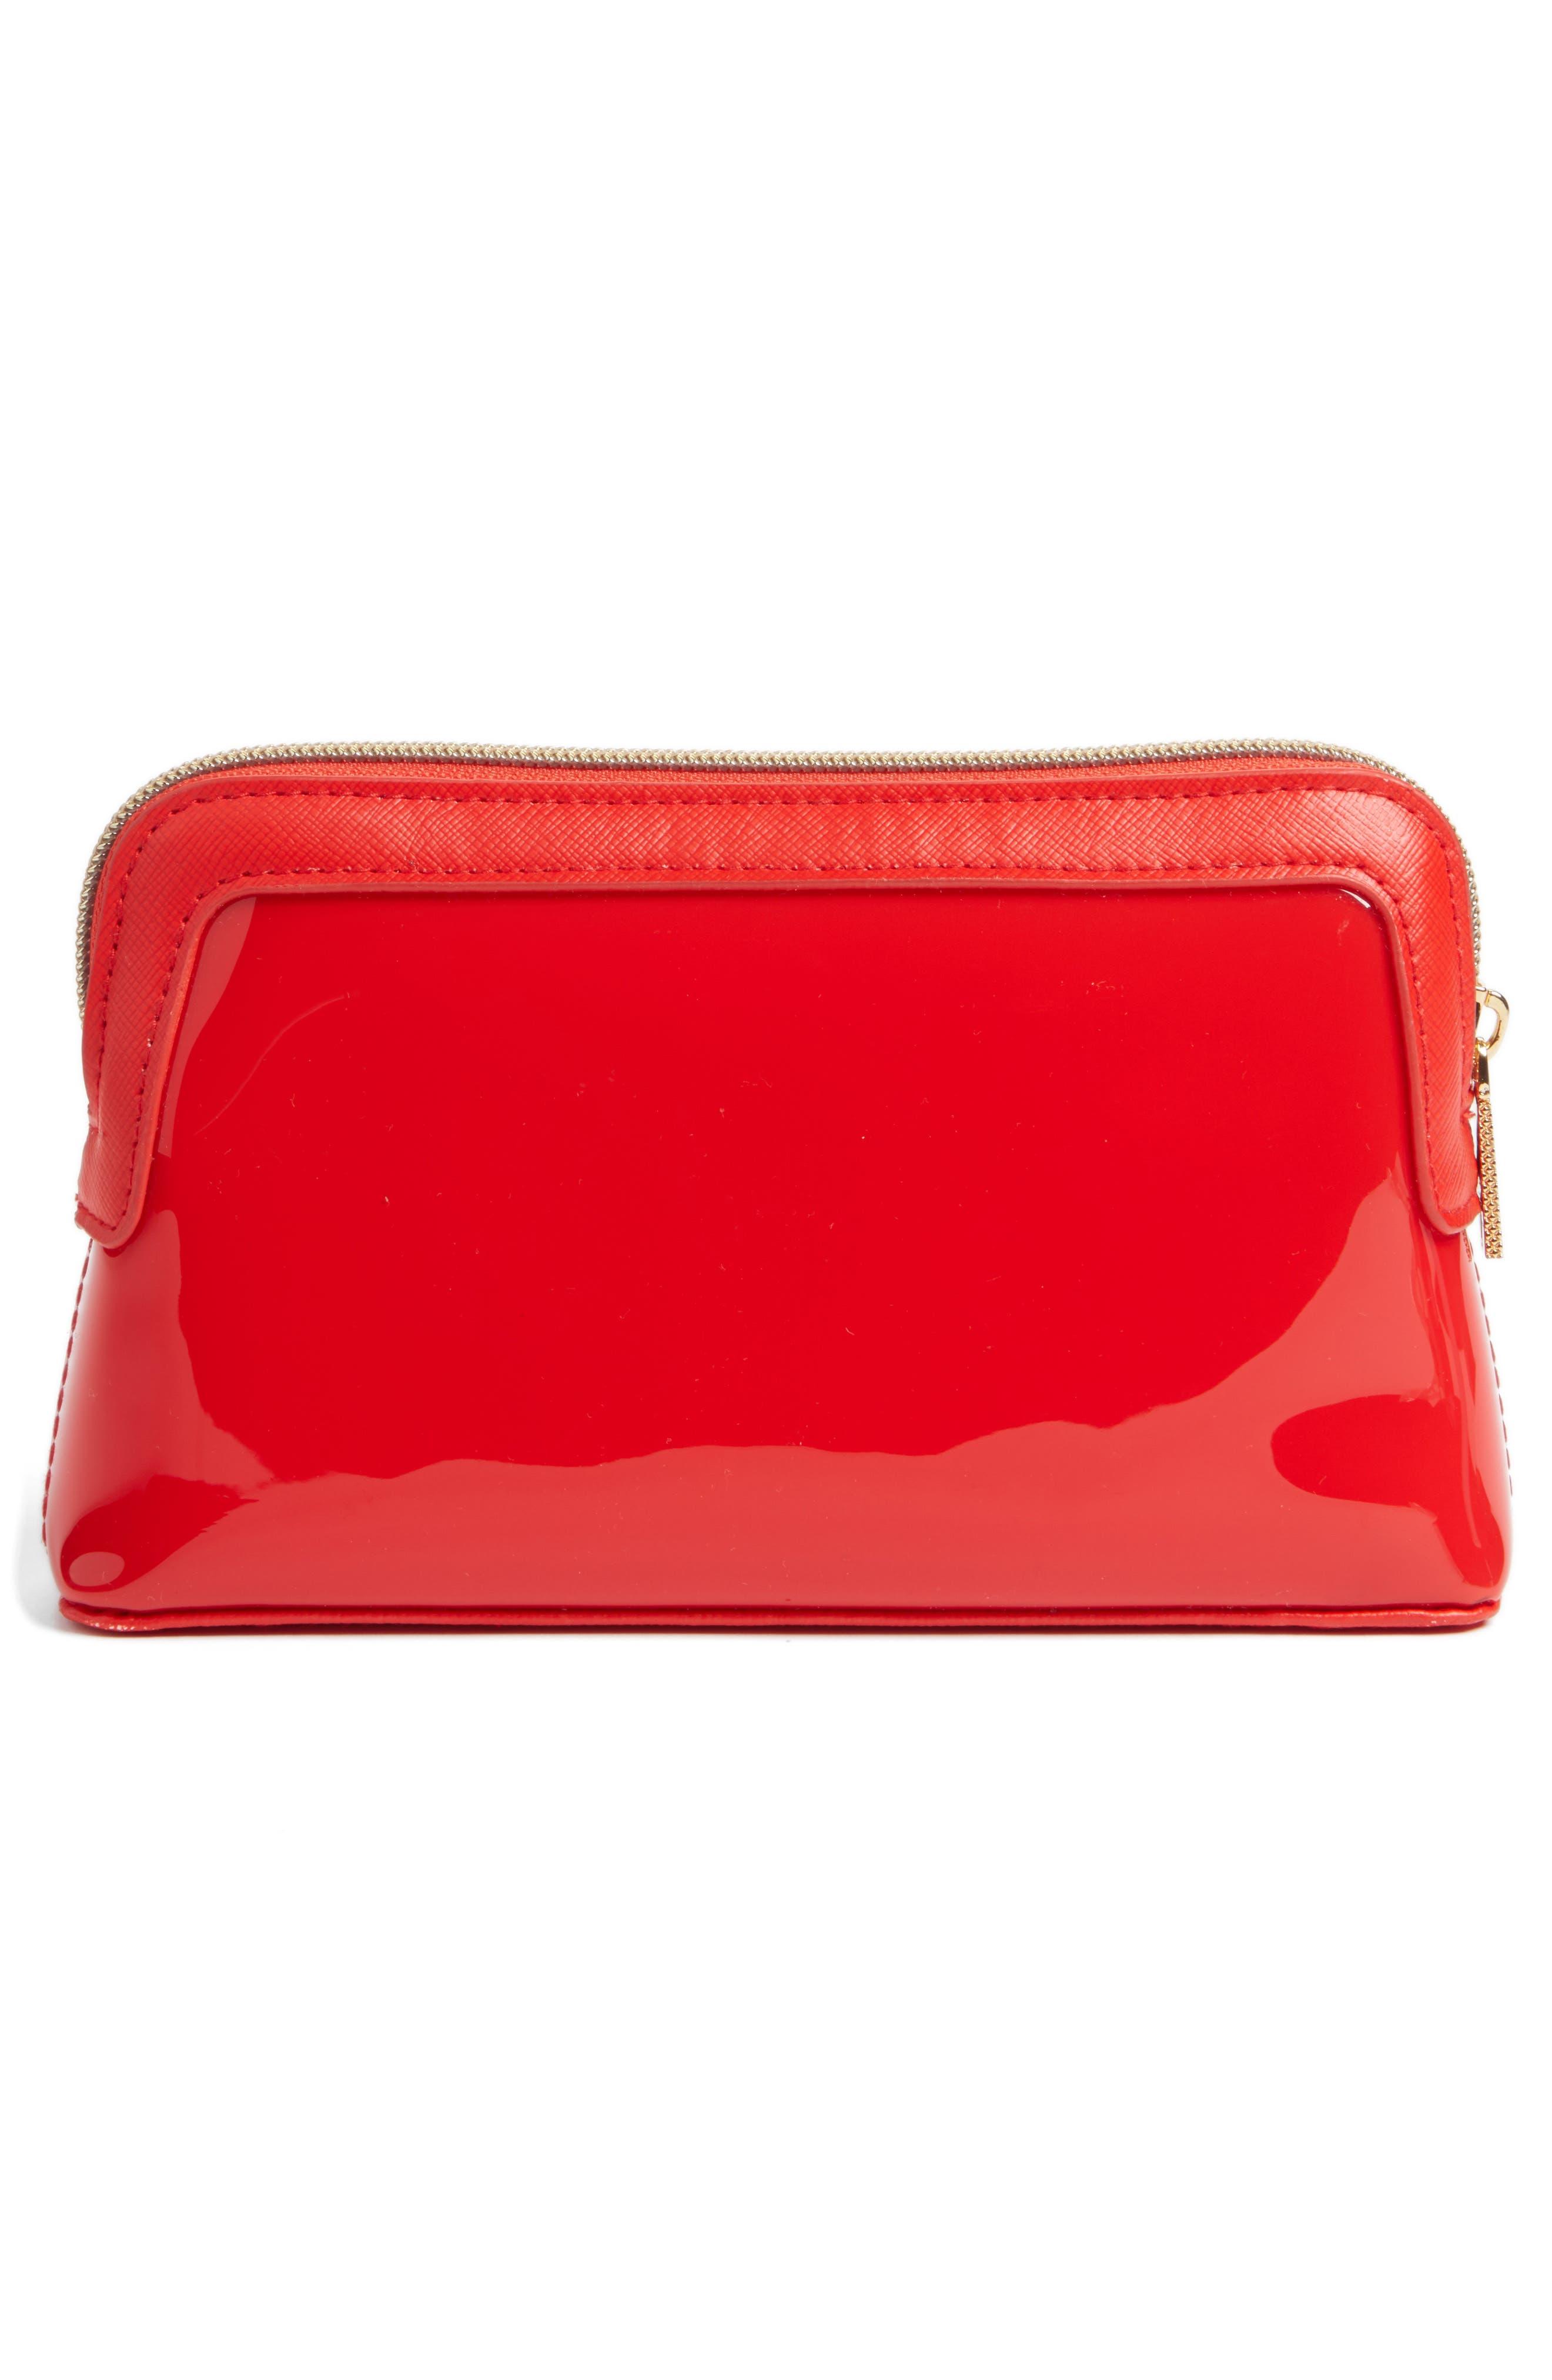 Alternate Image 2  - Ted Baker London Heart Cosmetics Bag